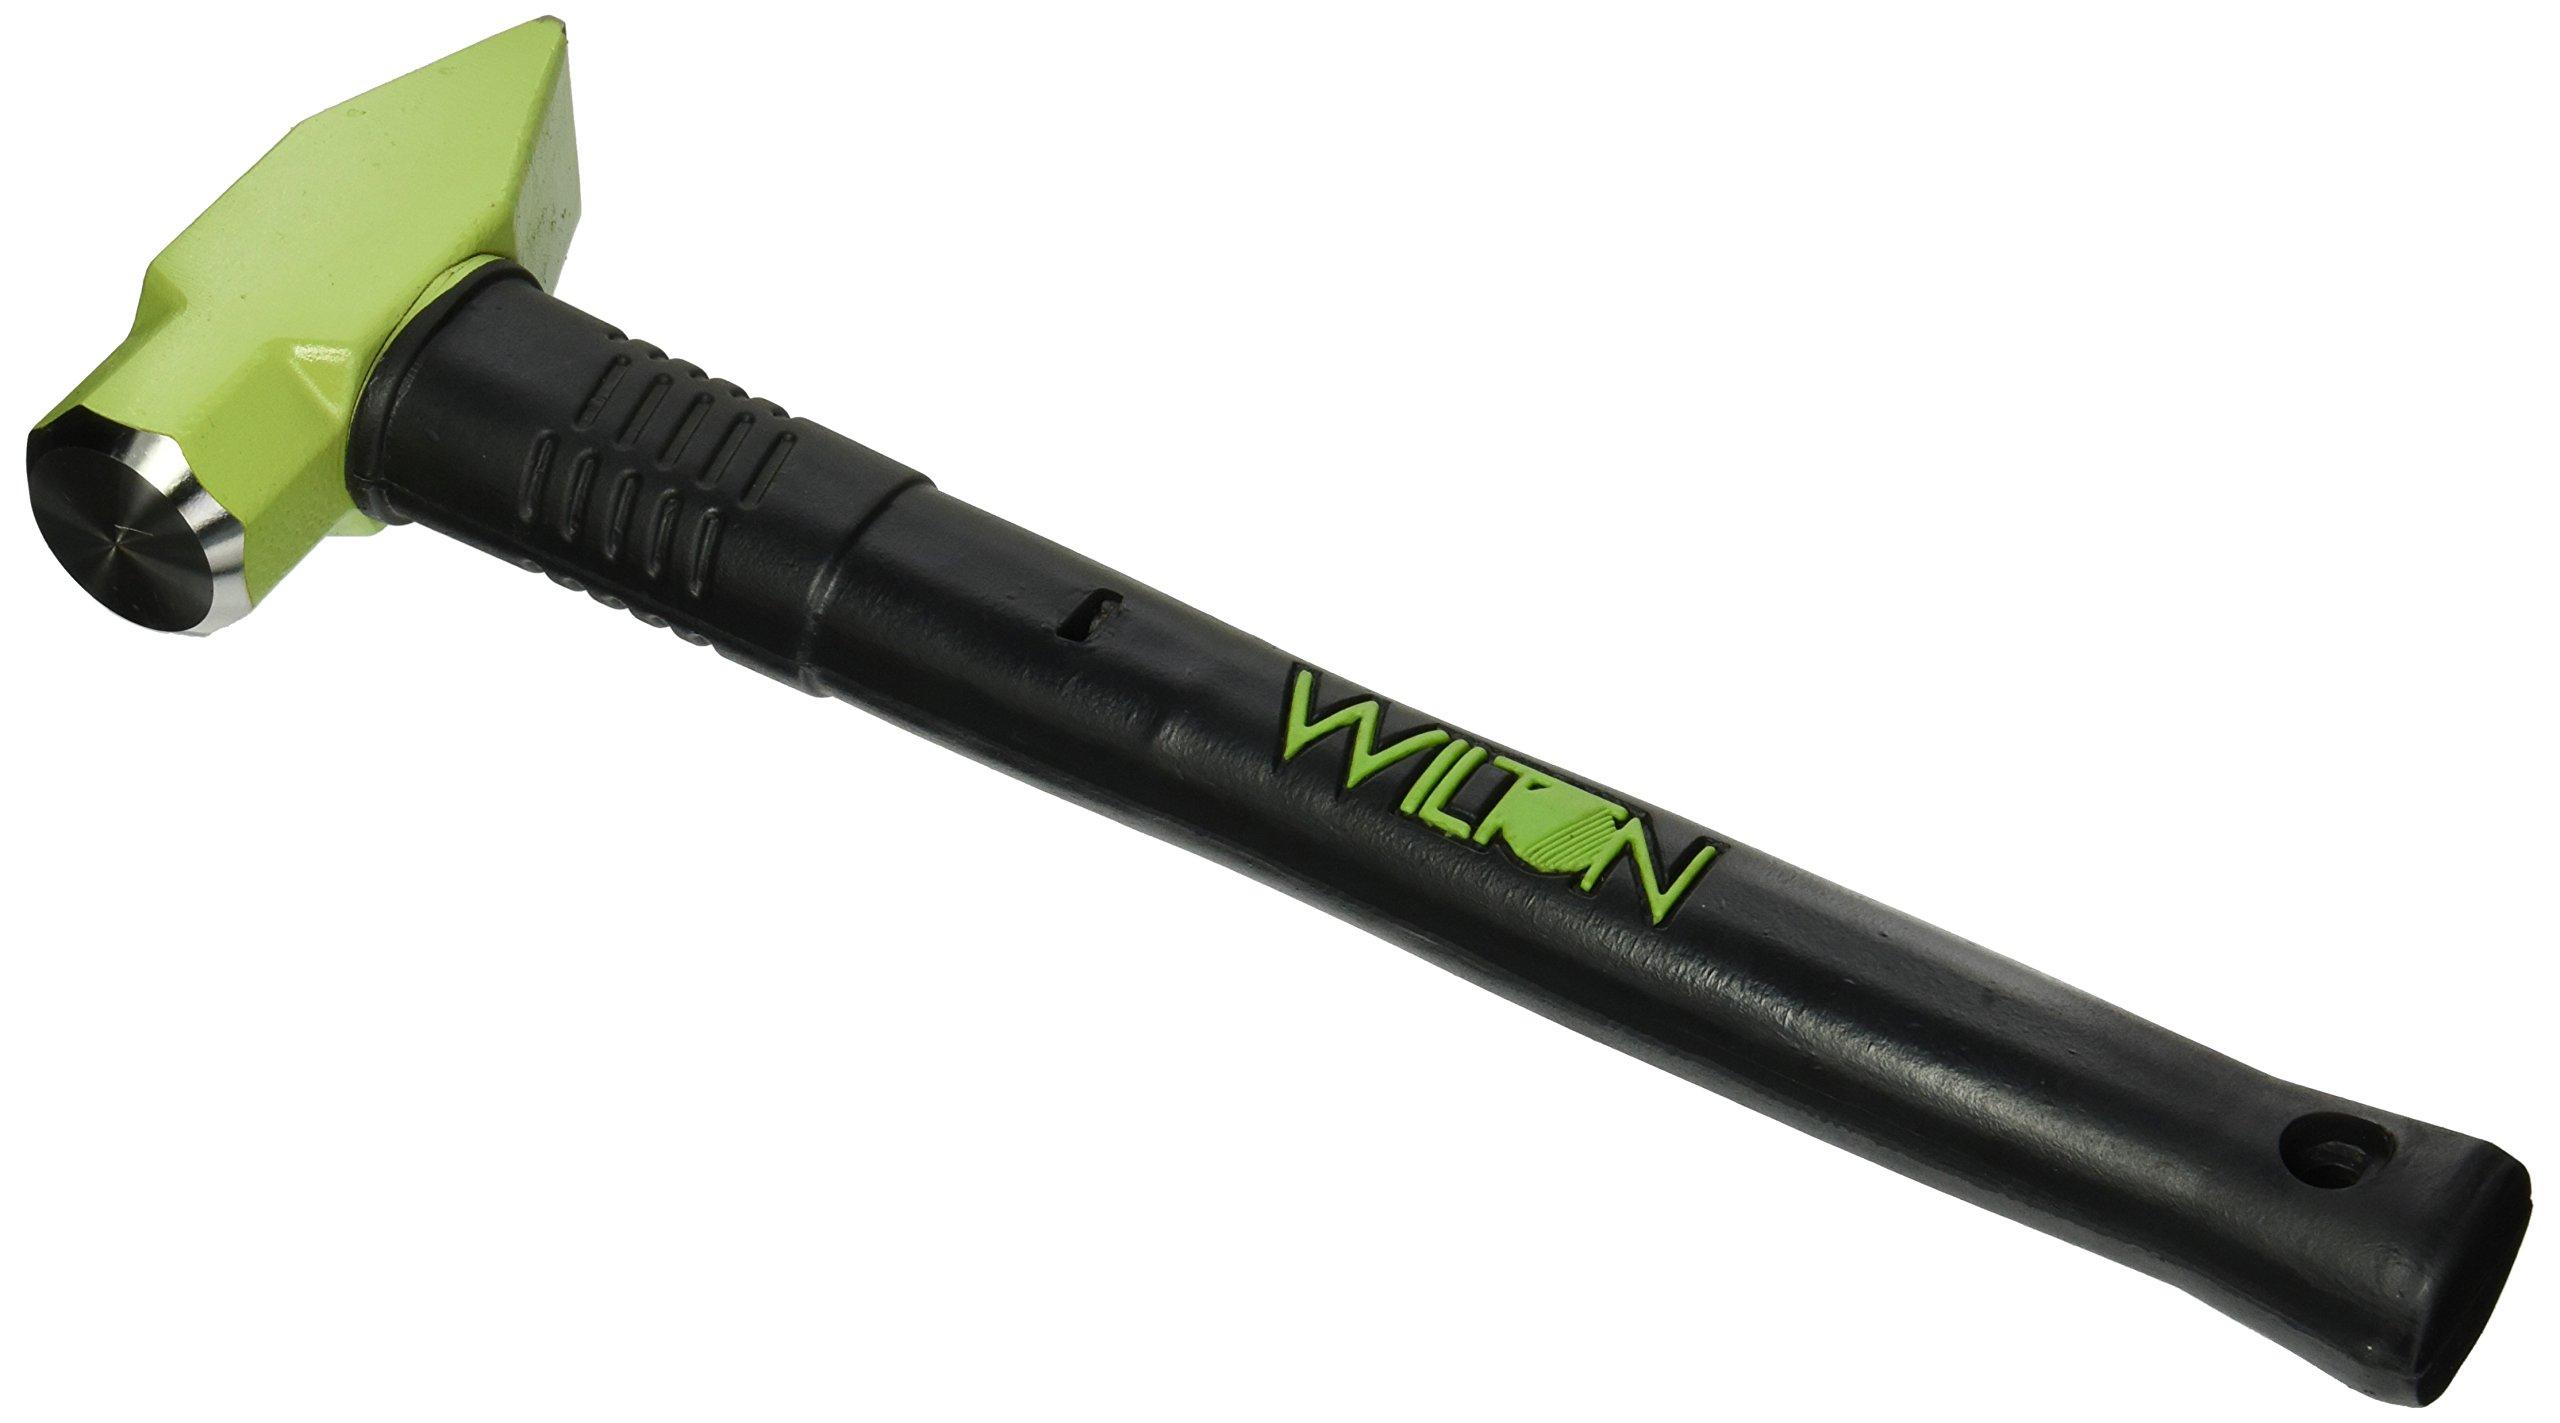 Wilton 30216 BASH Cross Pein Hammer 2lb Head, 16-Inches